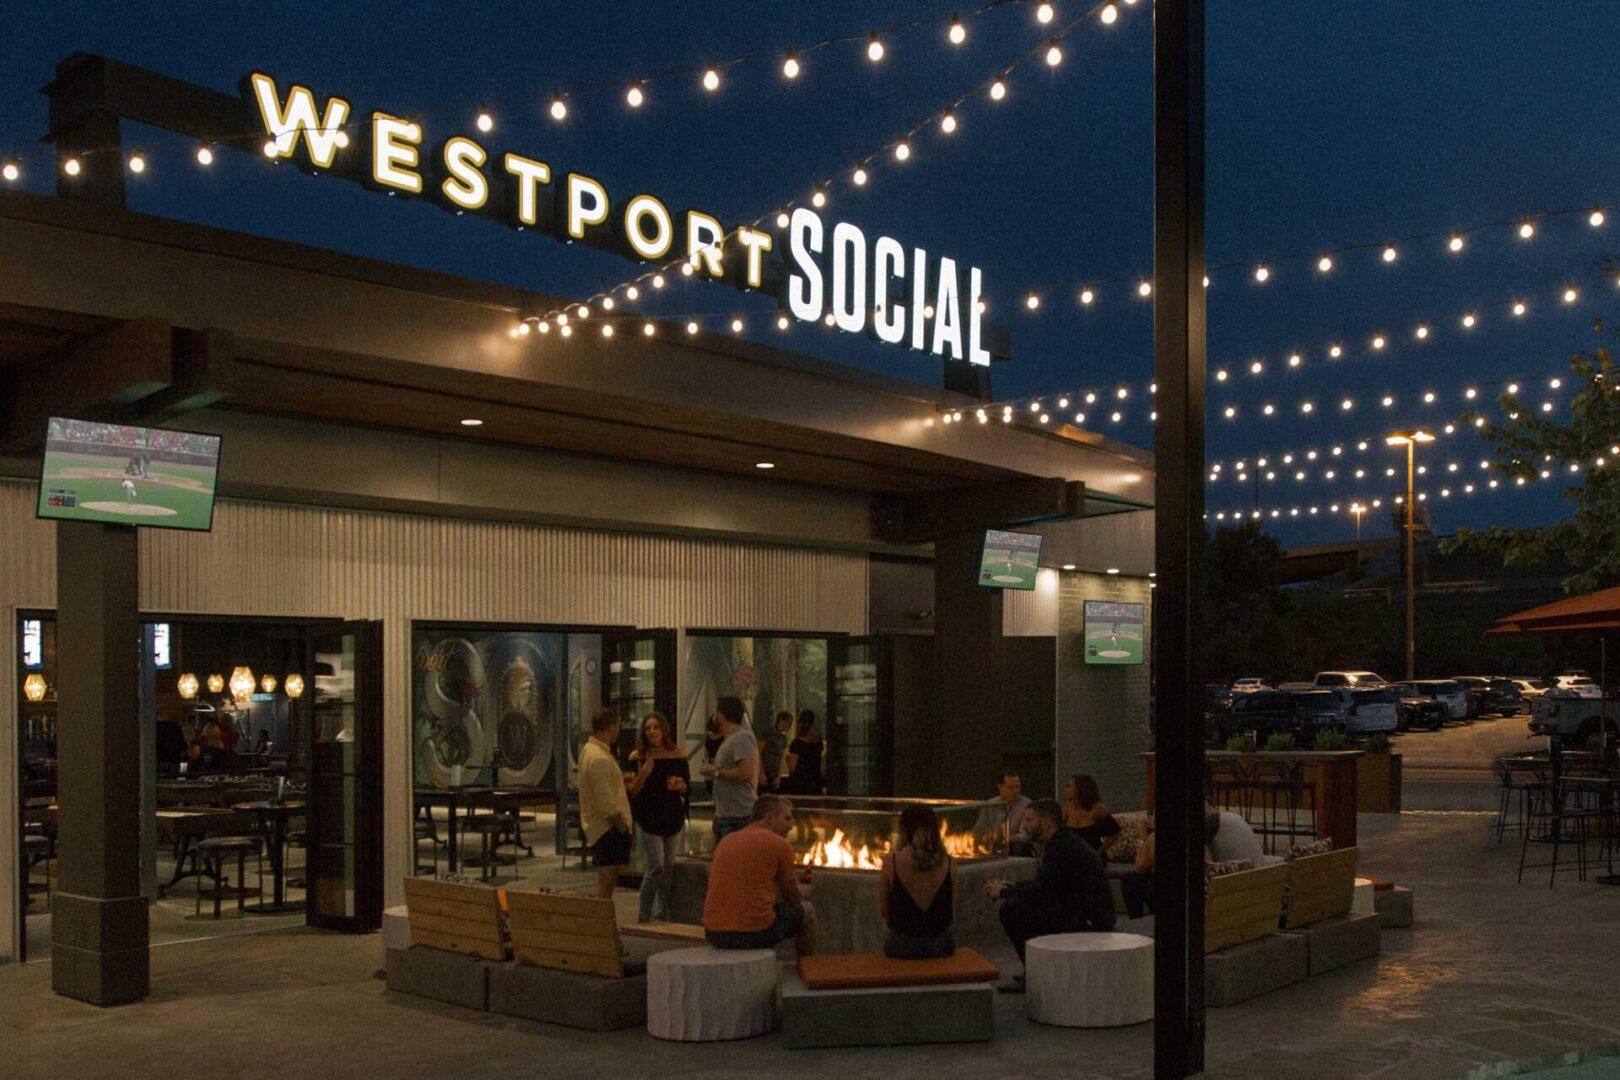 WESTPORT SOCIAL